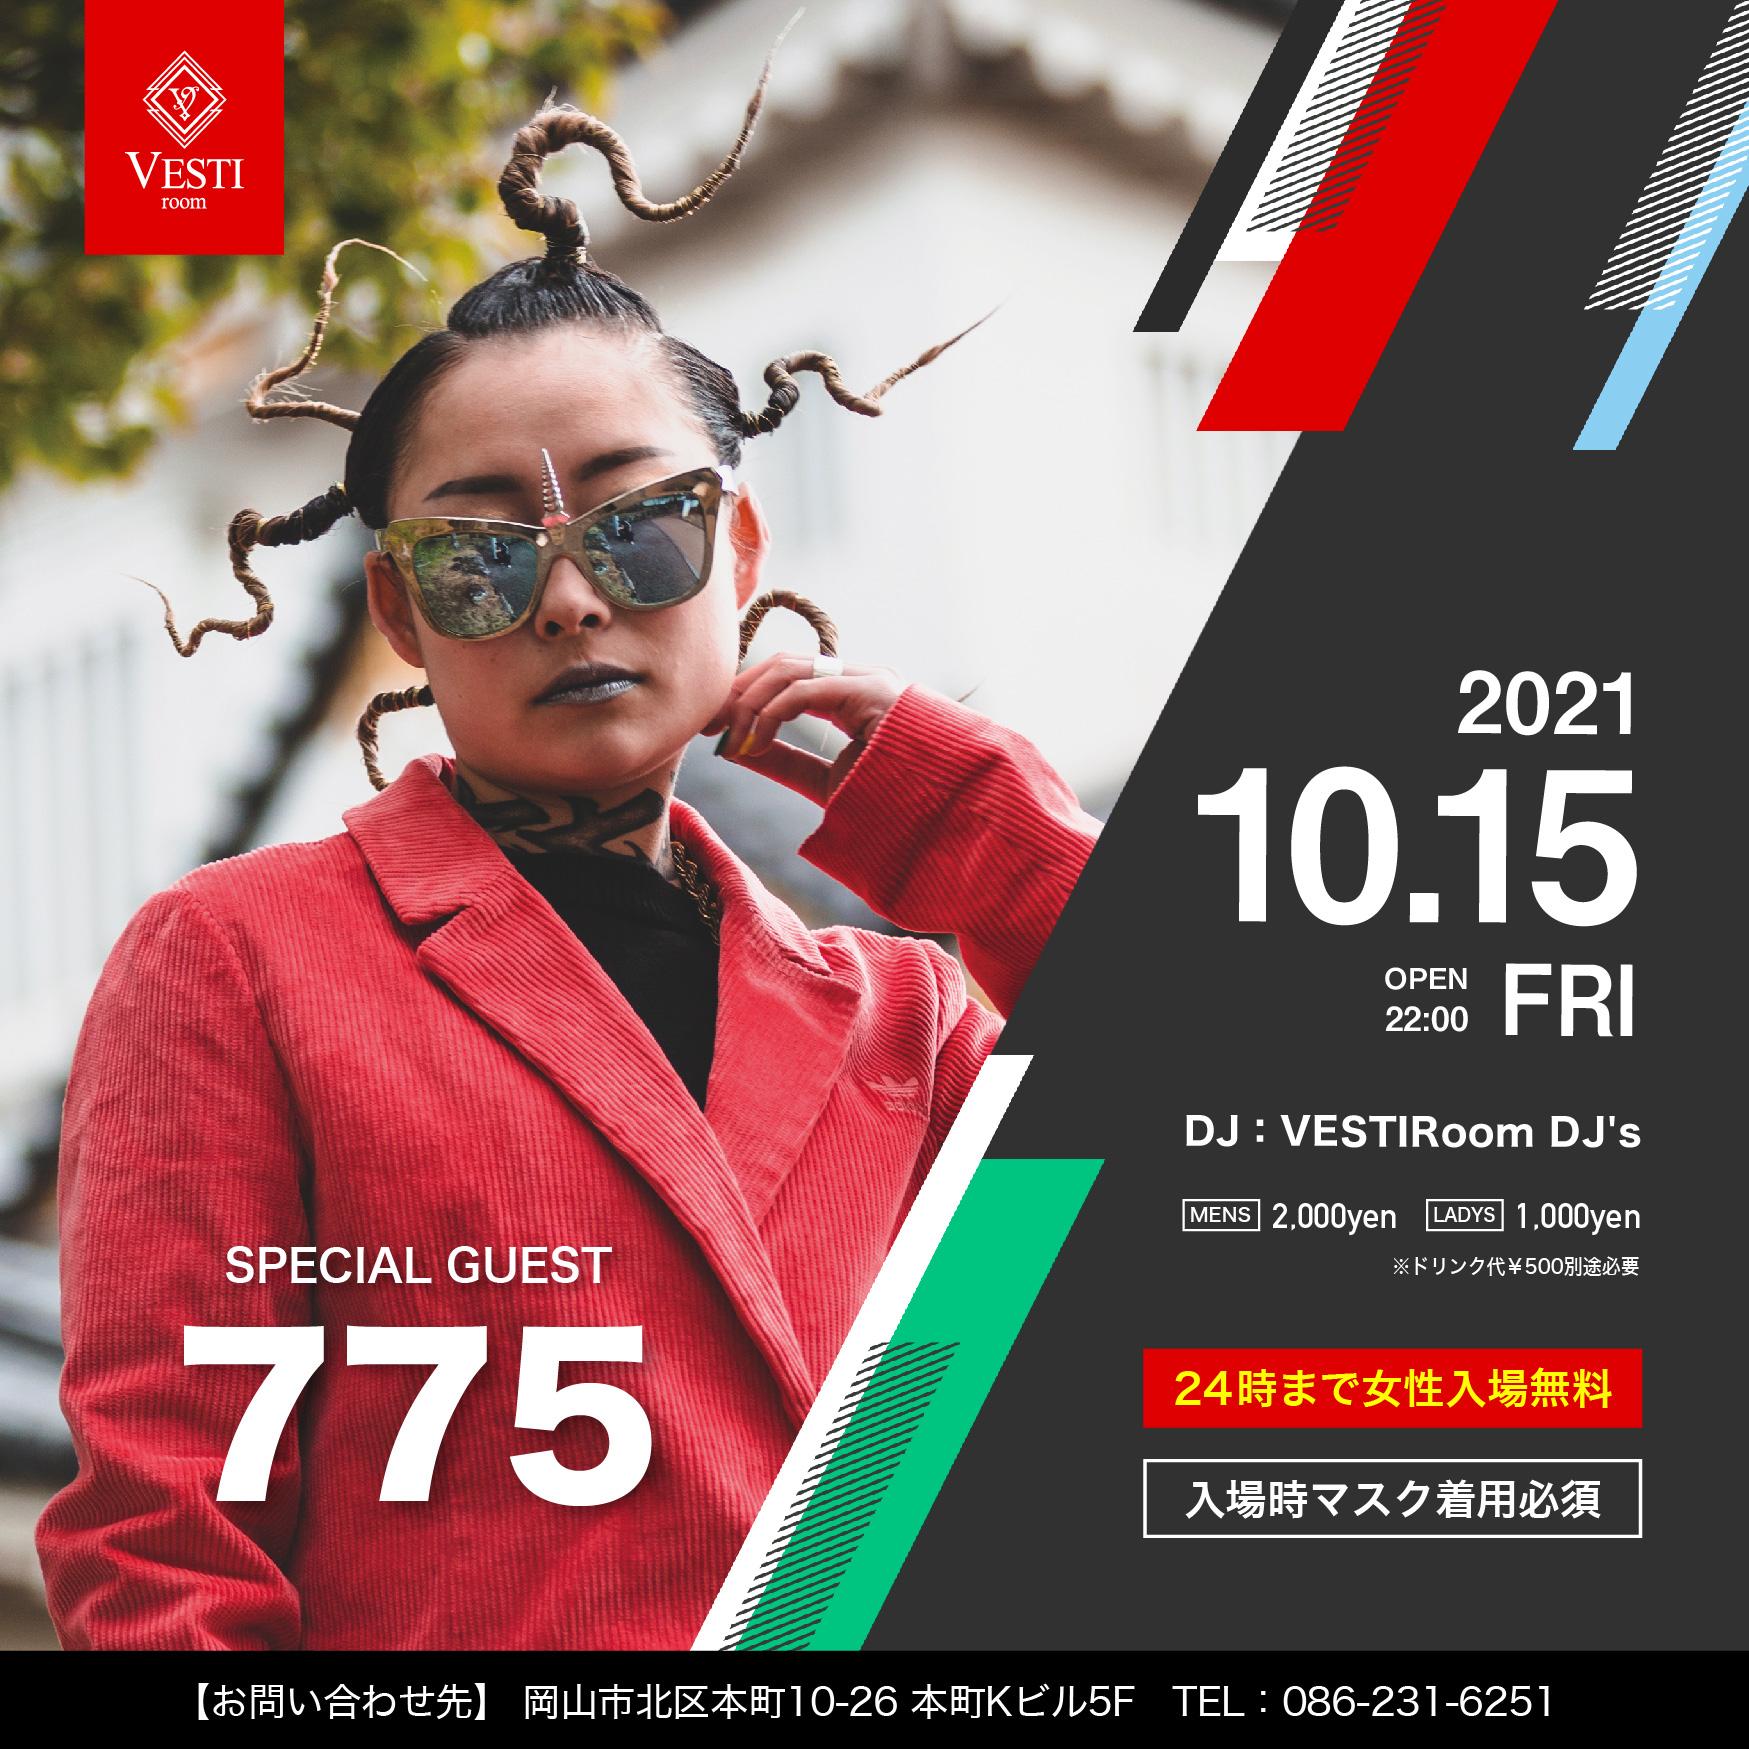 Special Guest : 775 ~24時まで女性入場無料~